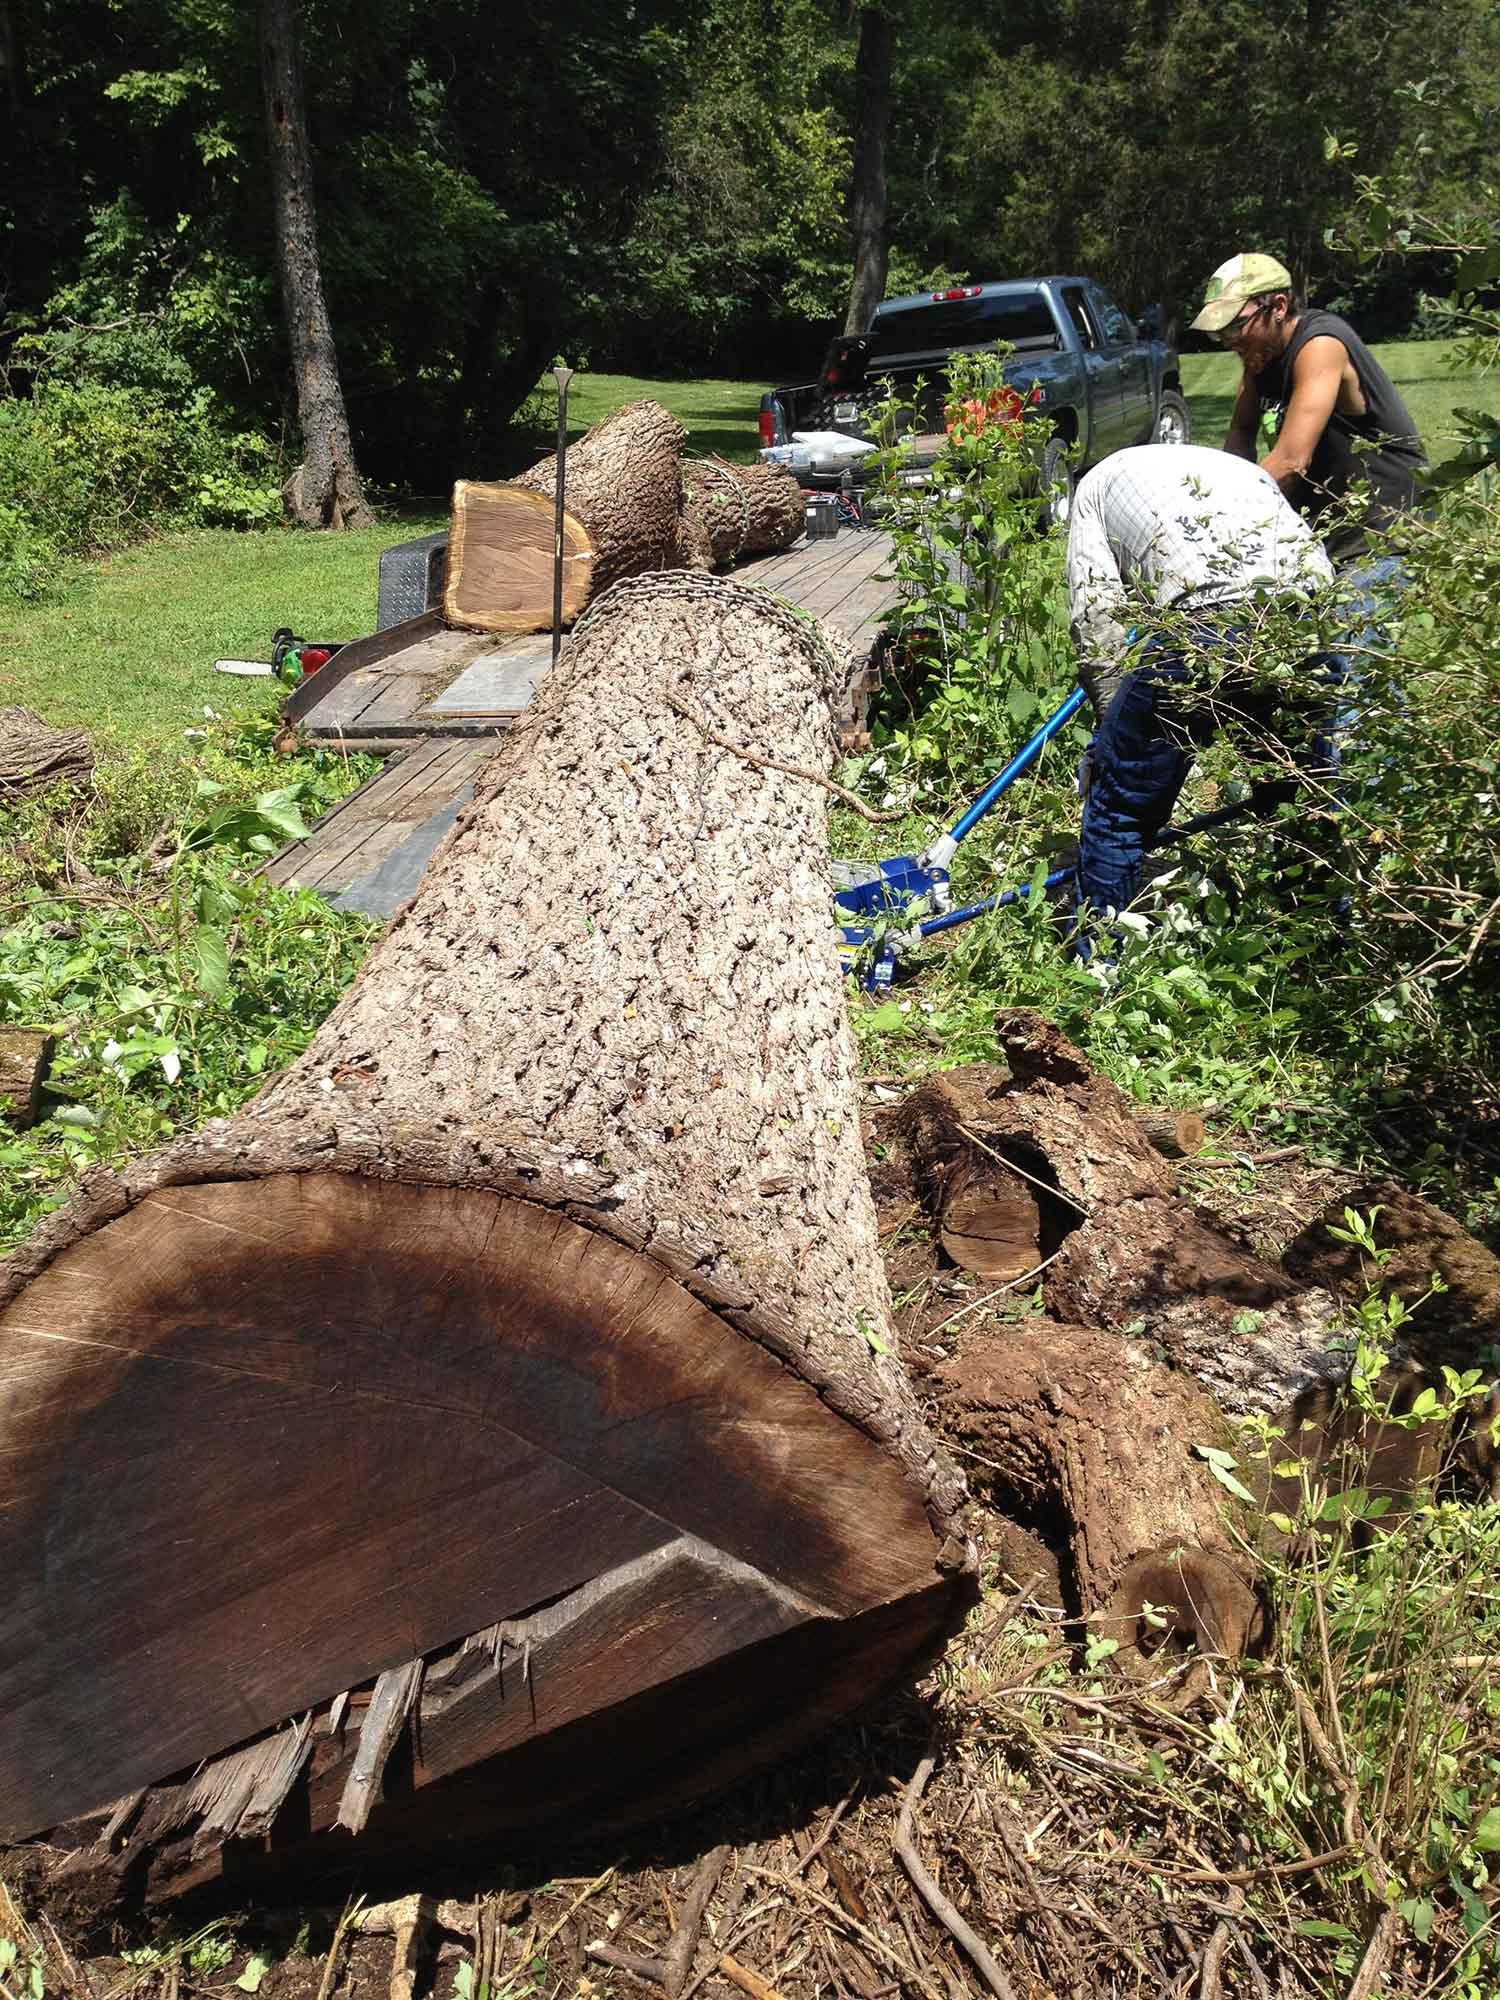 sawmill-selects-36649.jpg